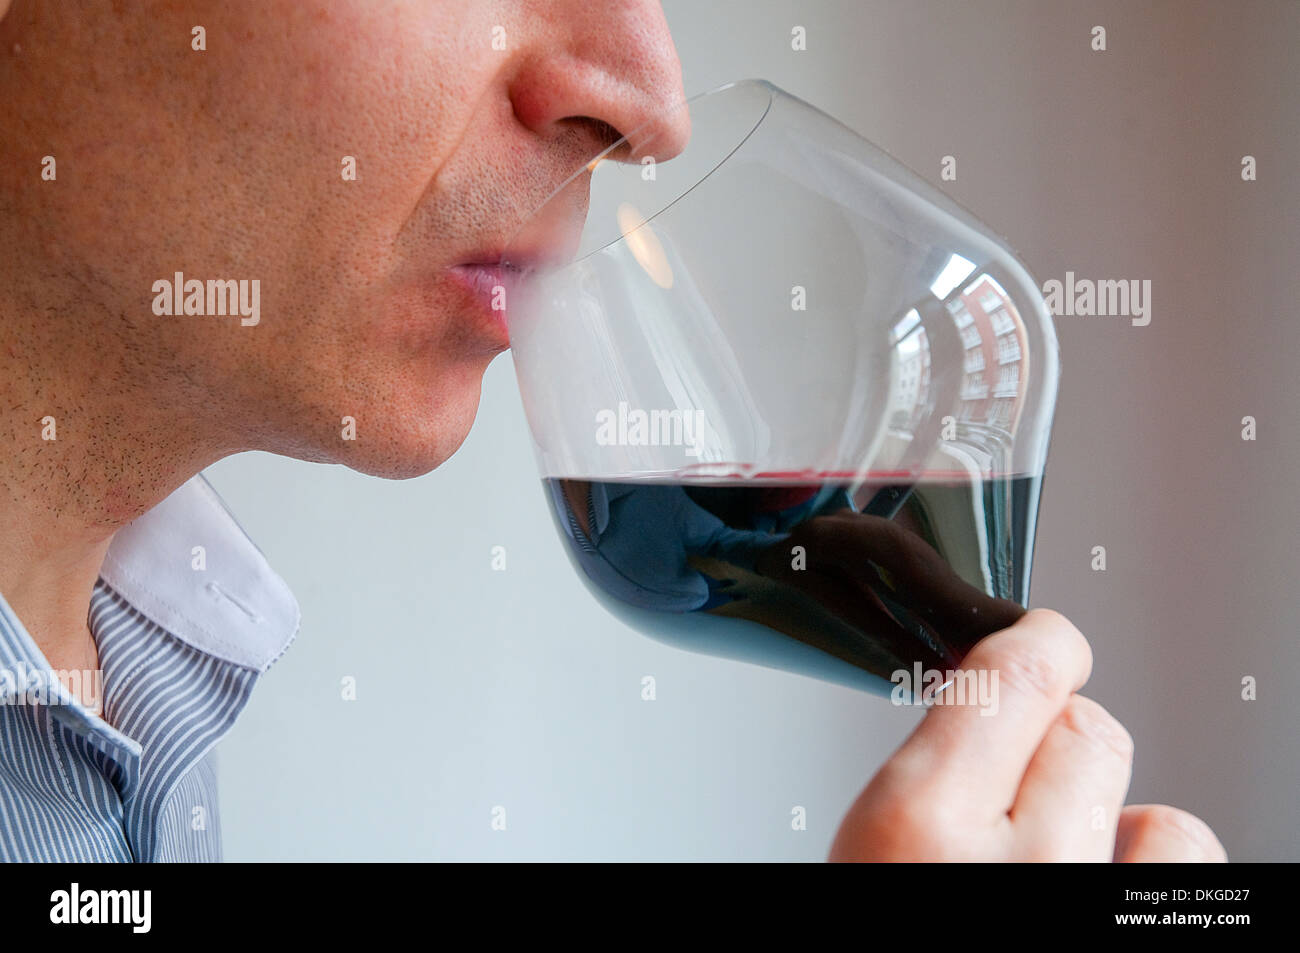 Catador beber un vaso de vino tinto. Cerrar vista. Foto de stock